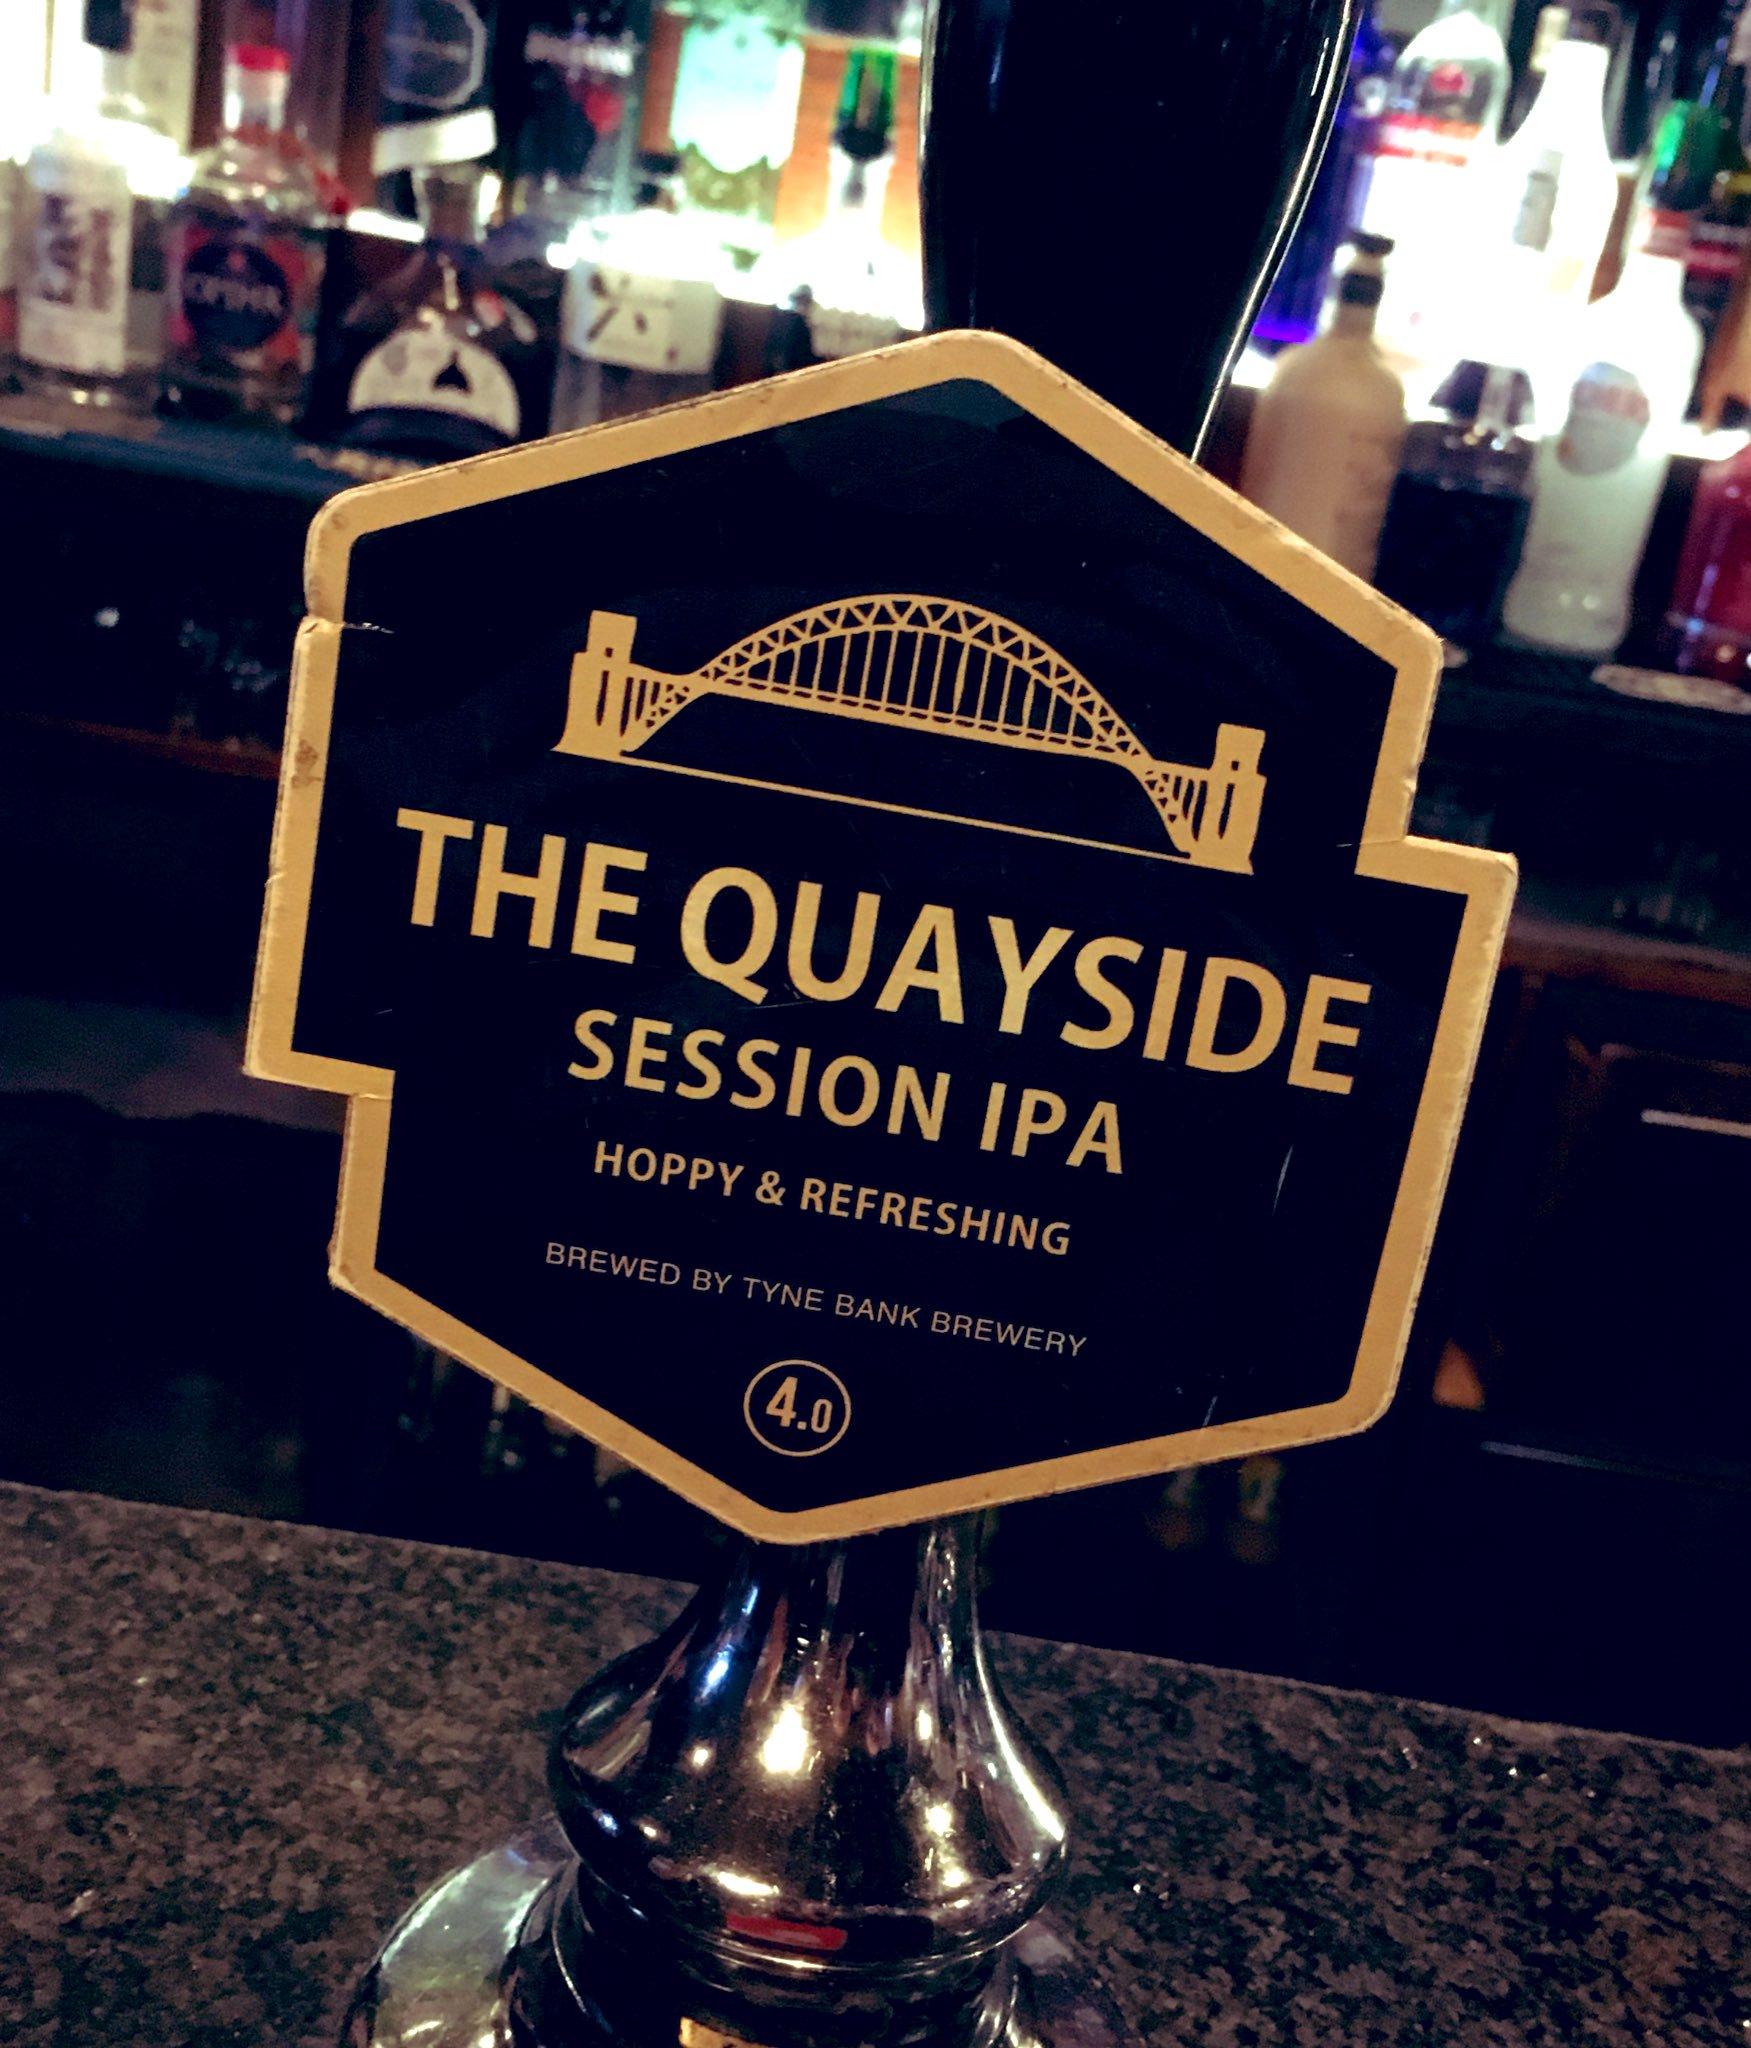 268: The Quayside